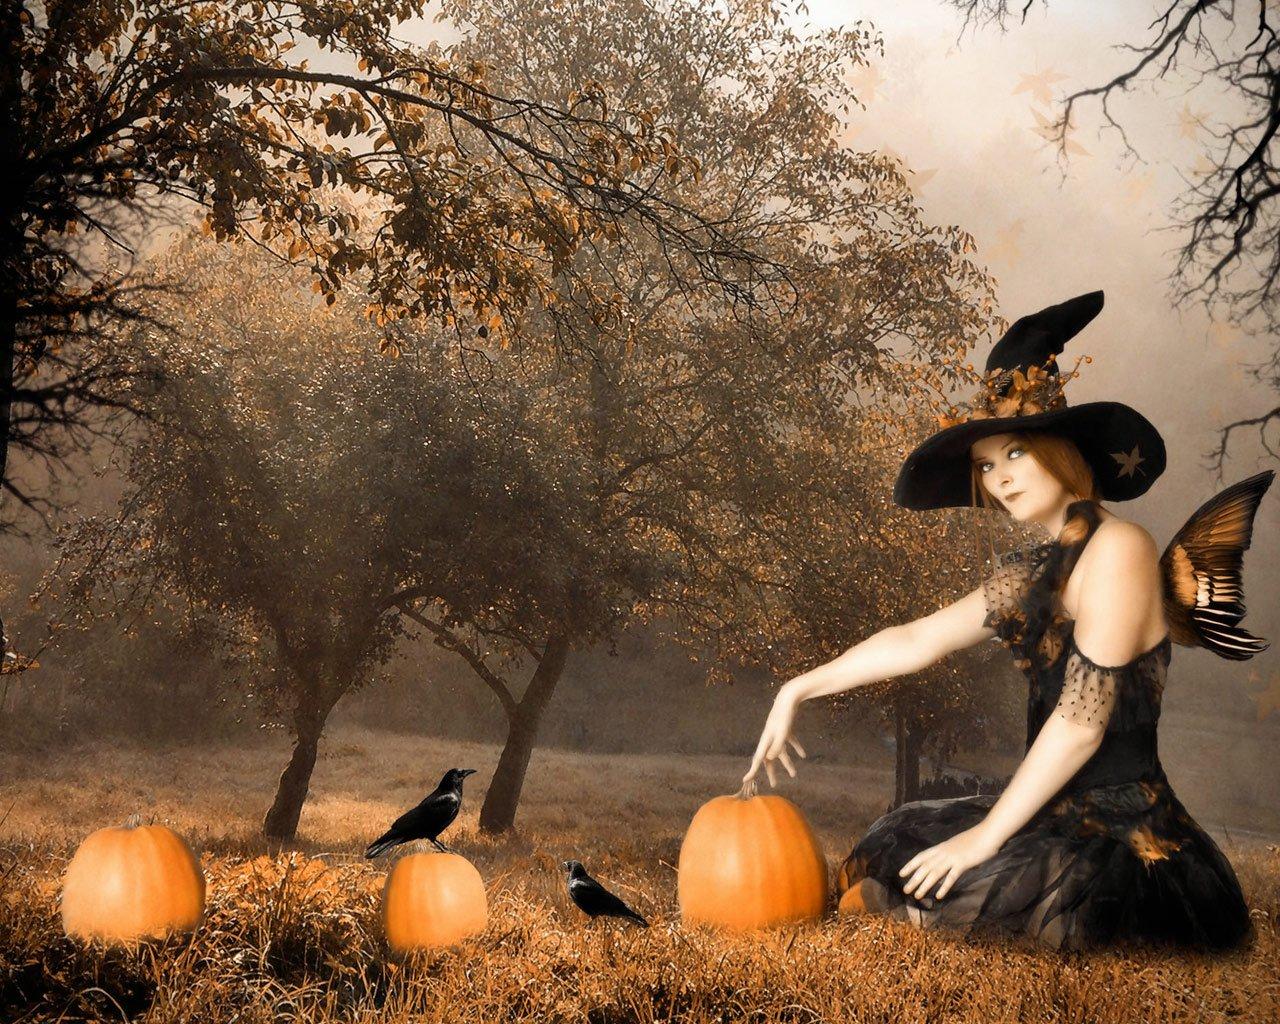 Fantasy   Witch Wallpaper 1280x1024